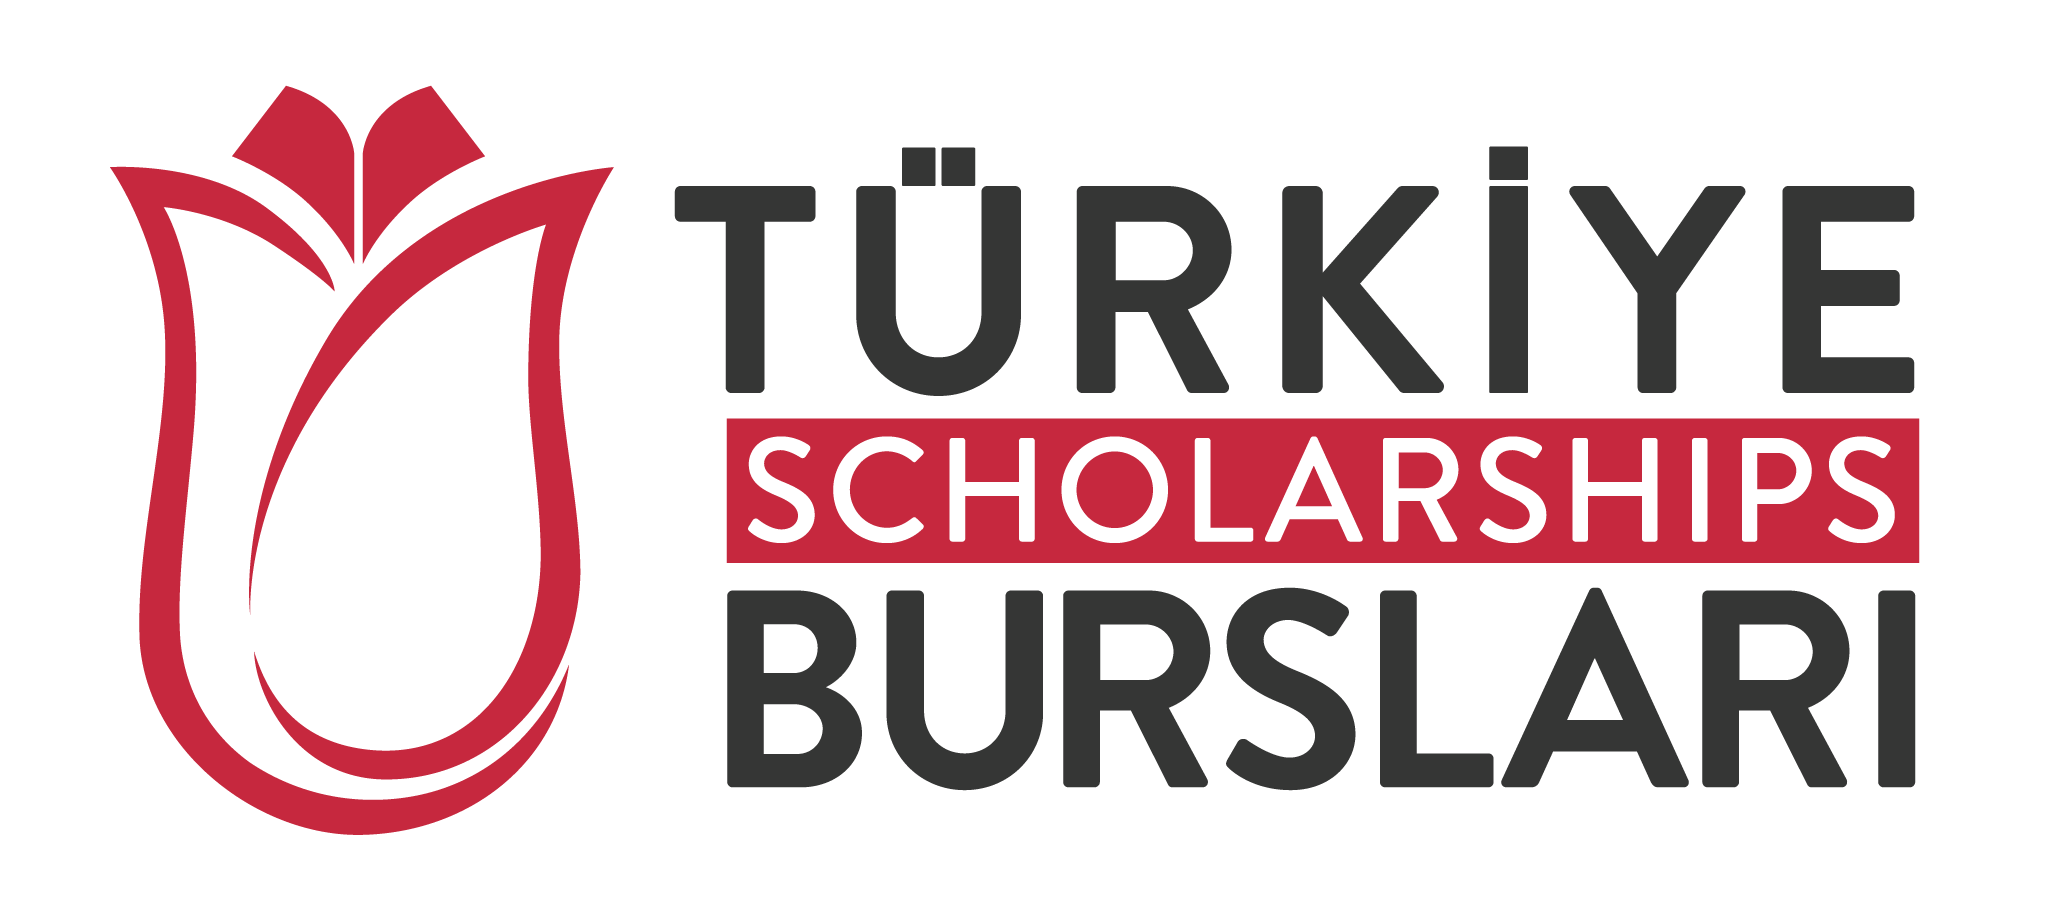 شرایط بورسیه ترکیه